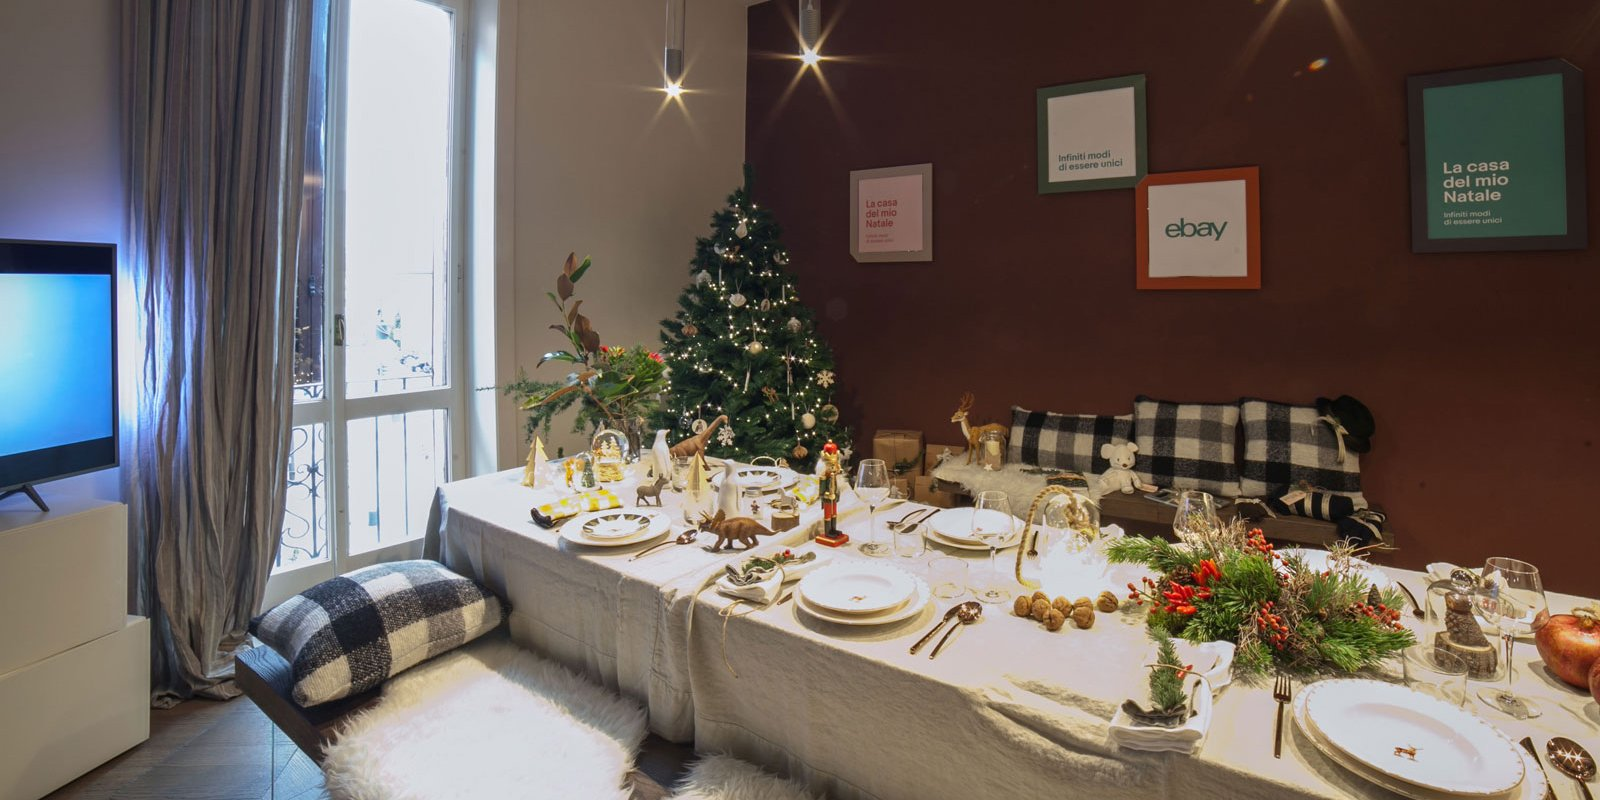 Regali Più Desiderati Per Natale Cose Di Casa #2975A2 1600 800 Sala Da Pranzo Grifoni